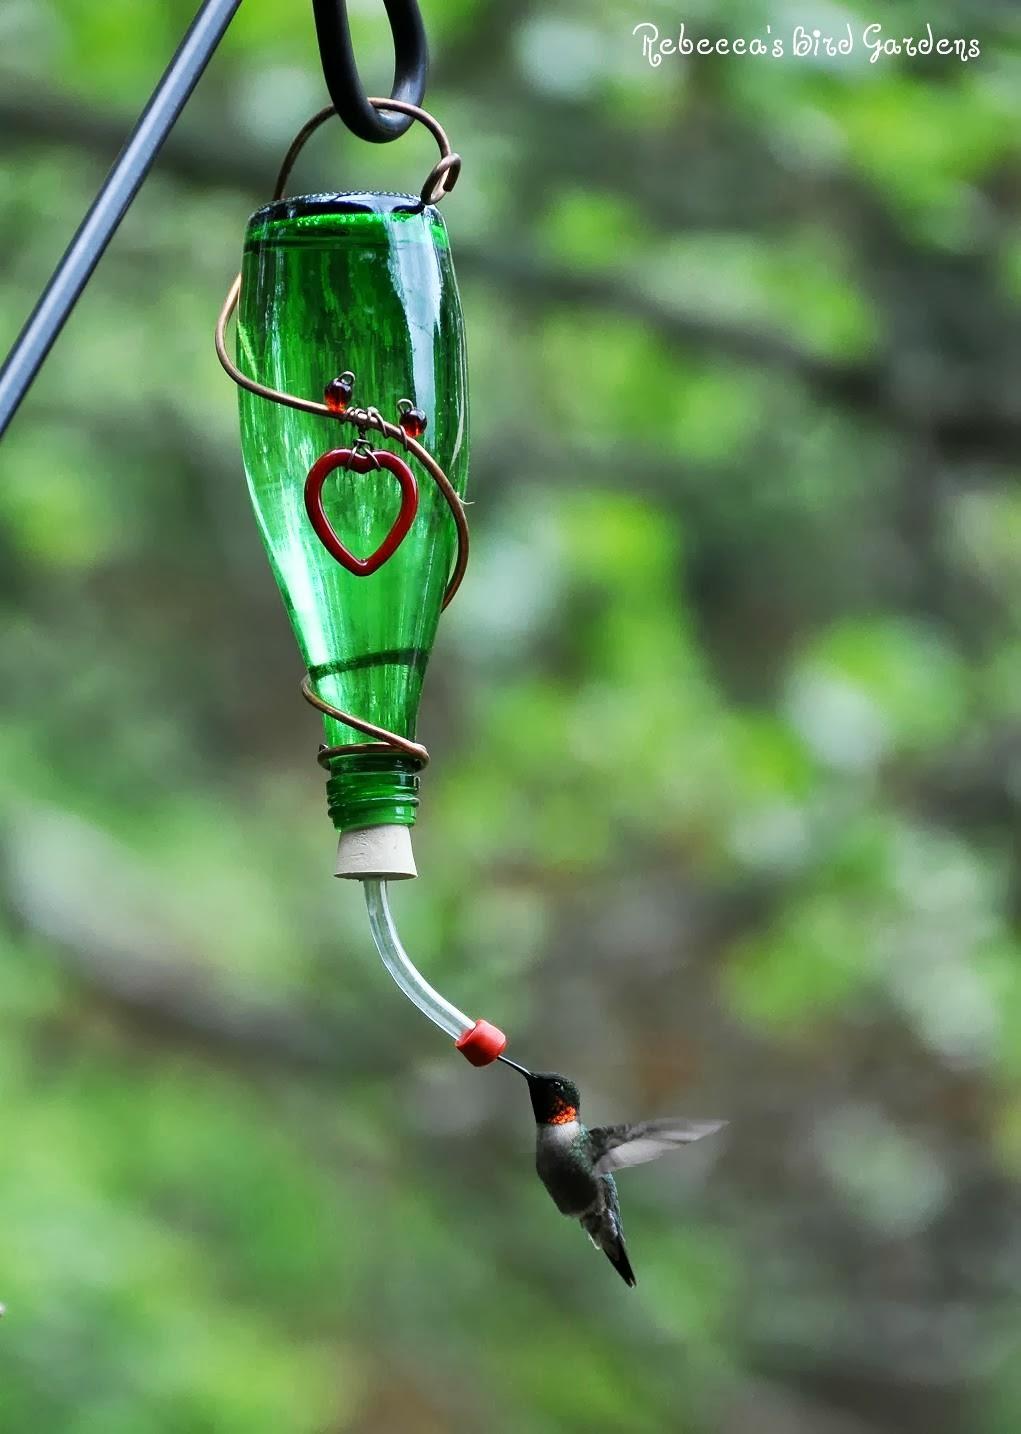 Rebecca's Bird Gardens Blog: DIY Fruit and Hummingbird Feeders